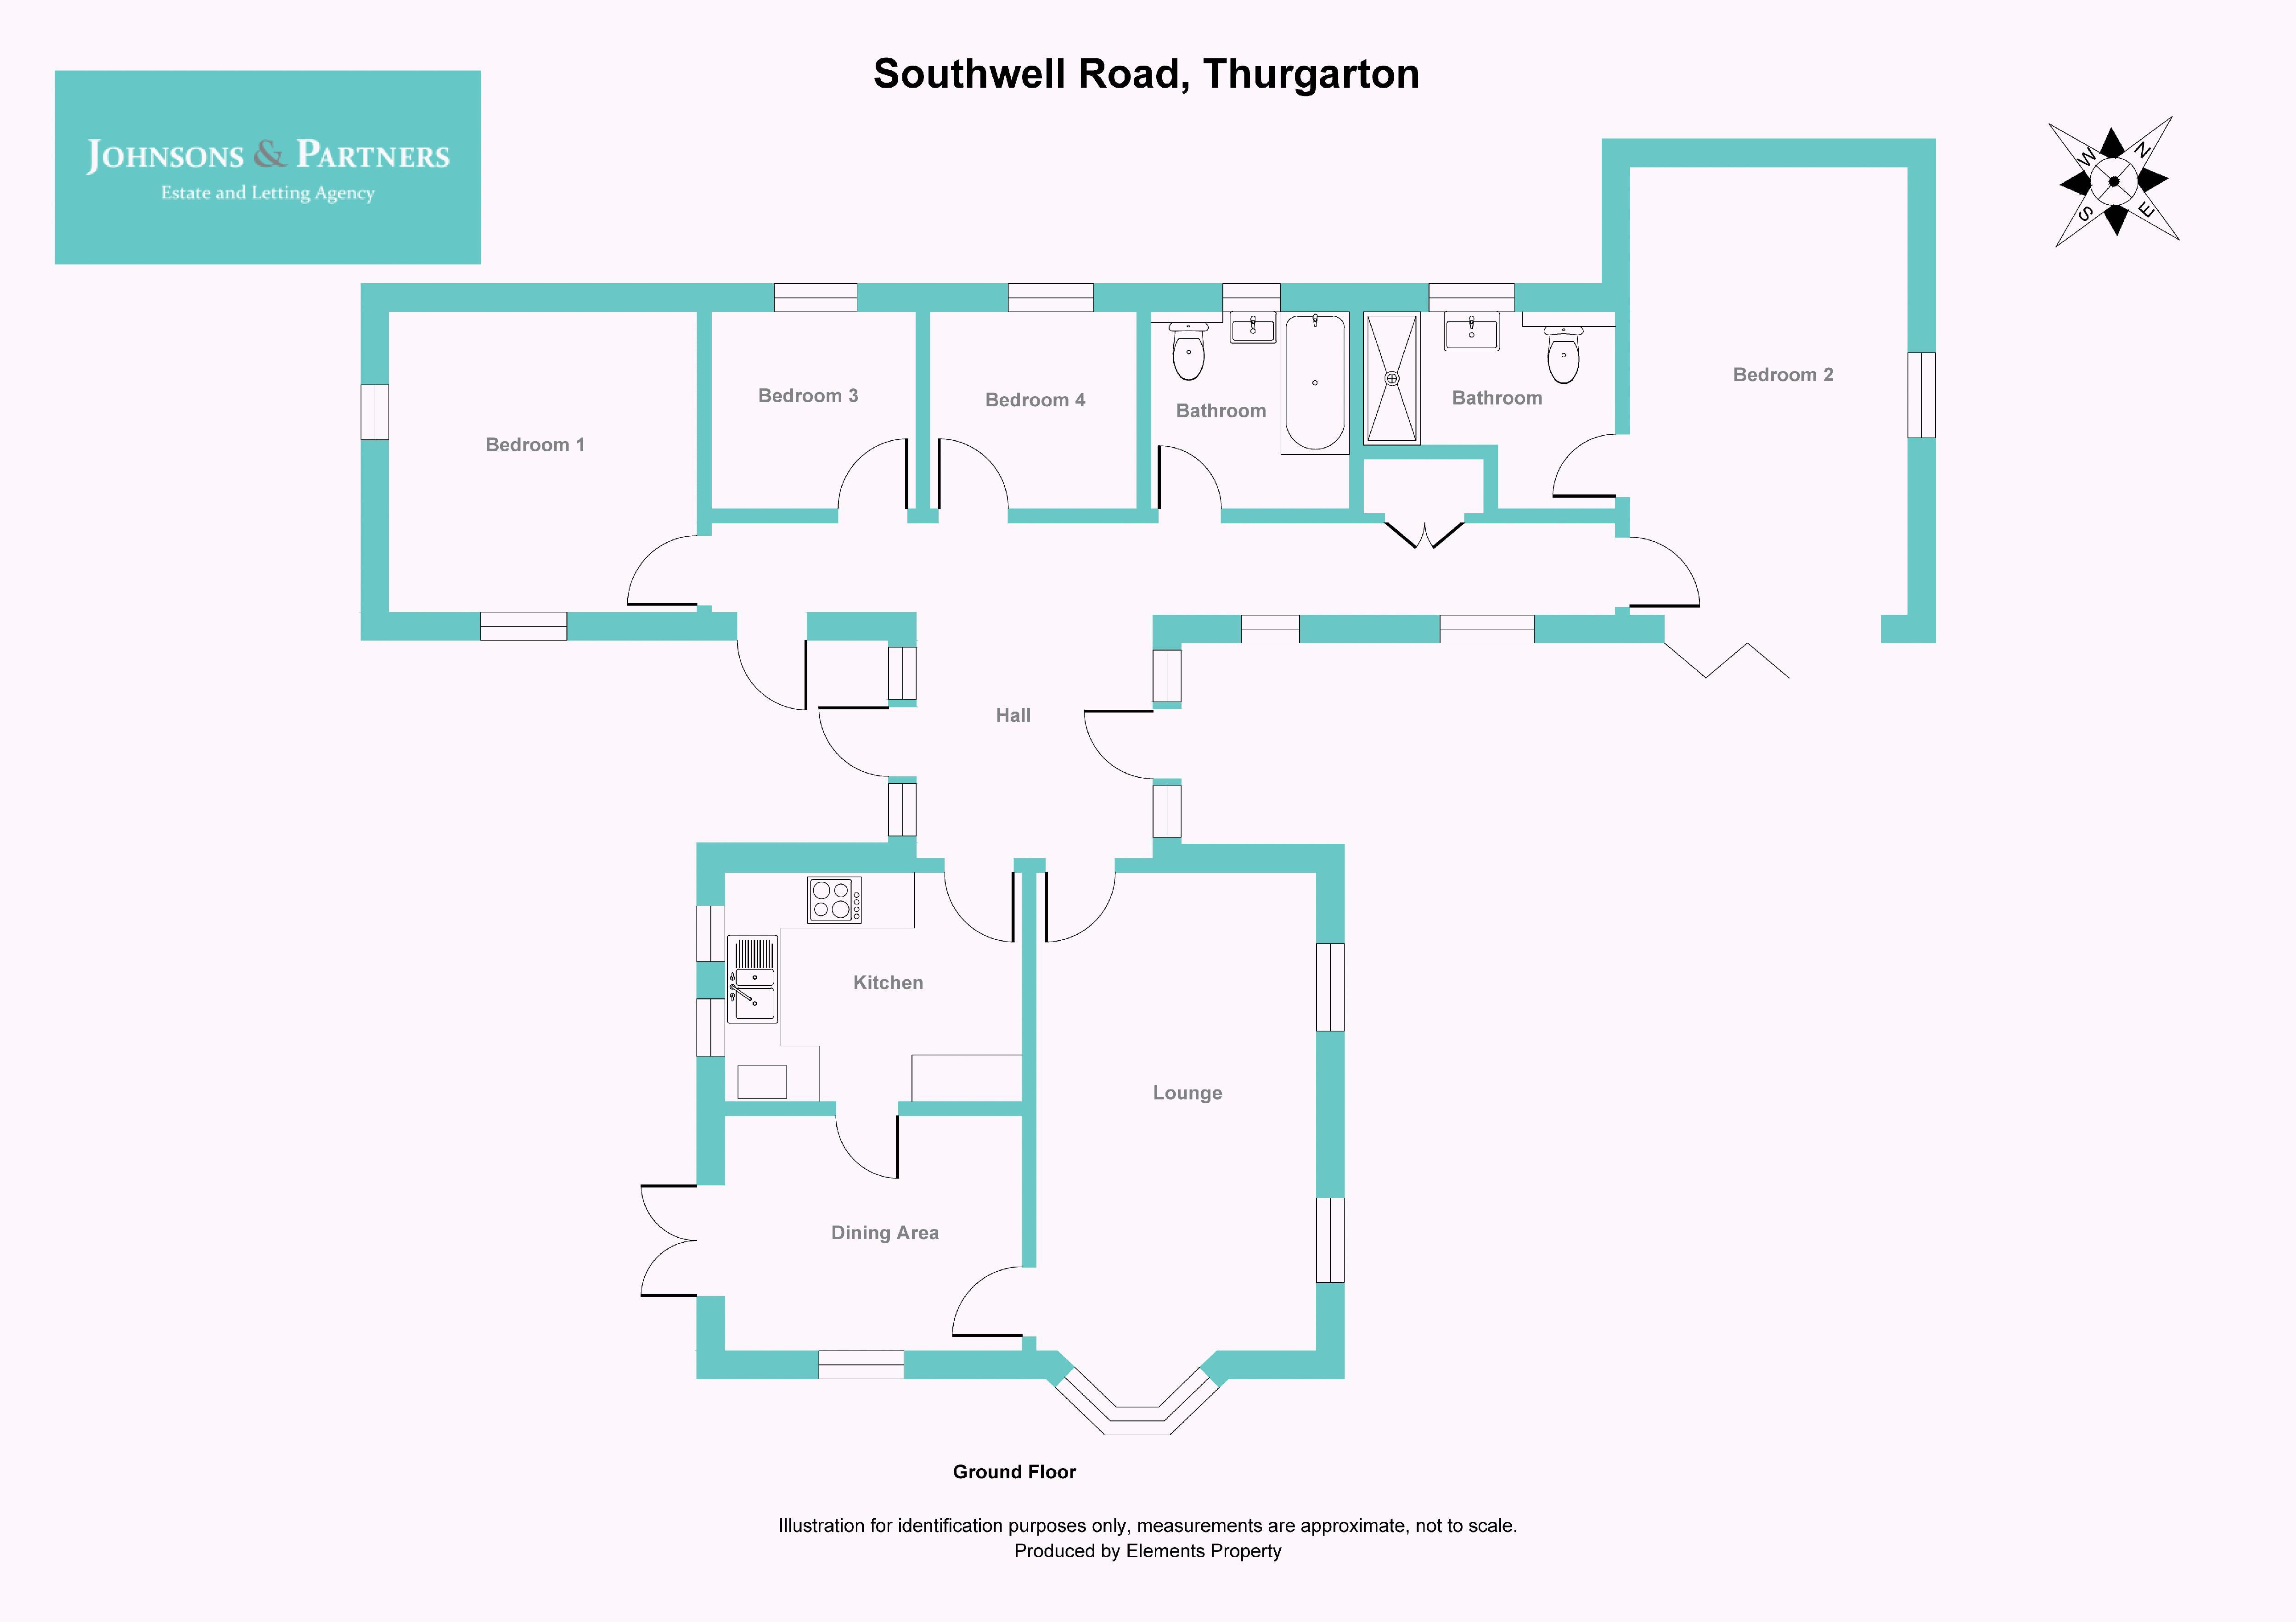 Southwell Road Thurgarton